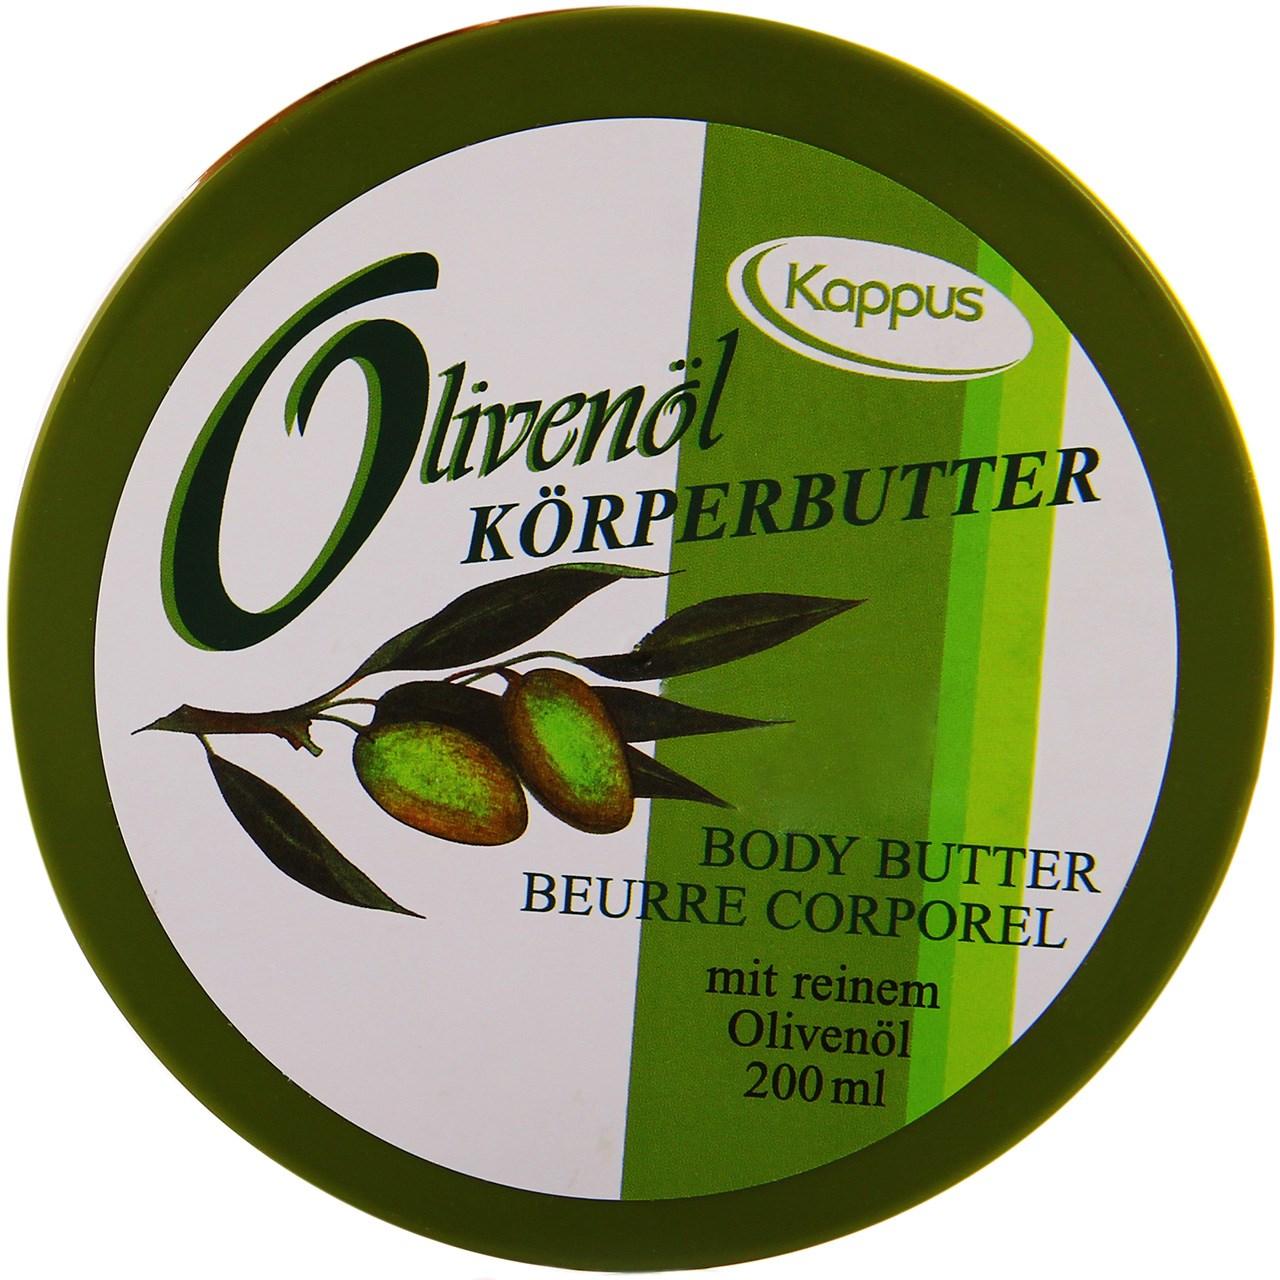 قیمت کره بدن کاپوس مدل Olive Oil حجم 200 میلی لیتر